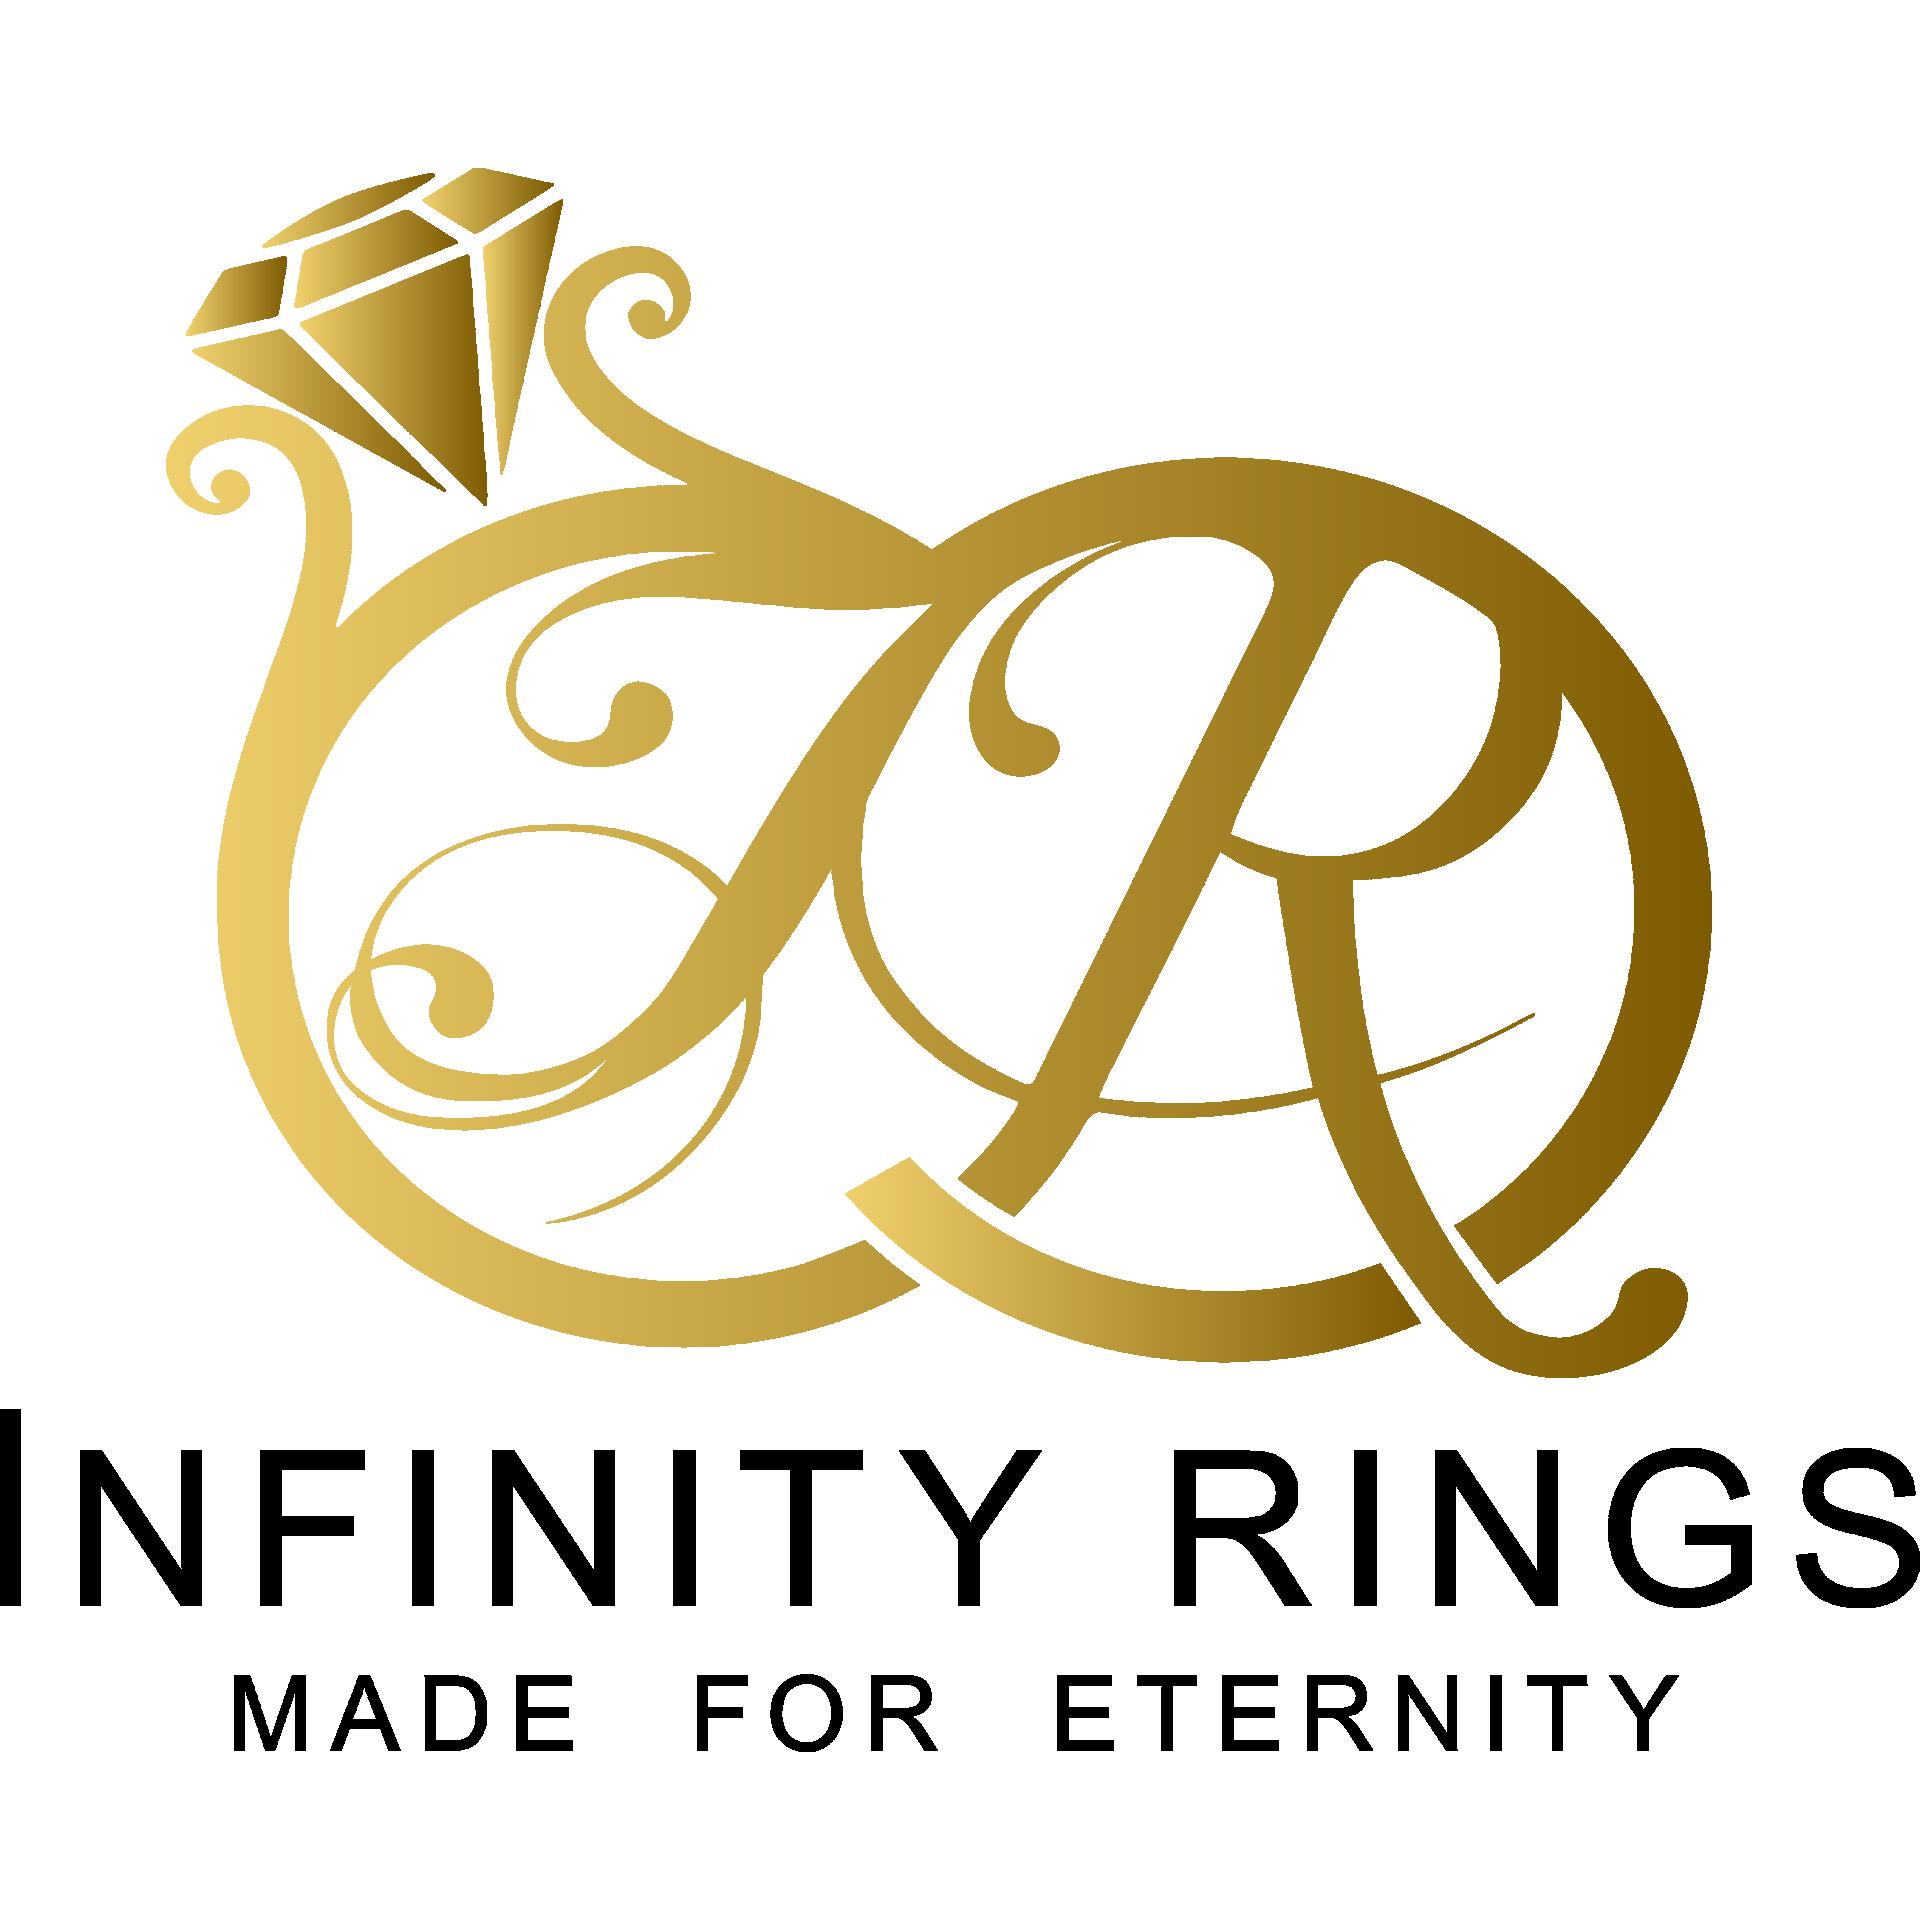 Perl-Ohrringe Silber 925 mit Muschelkernperlen